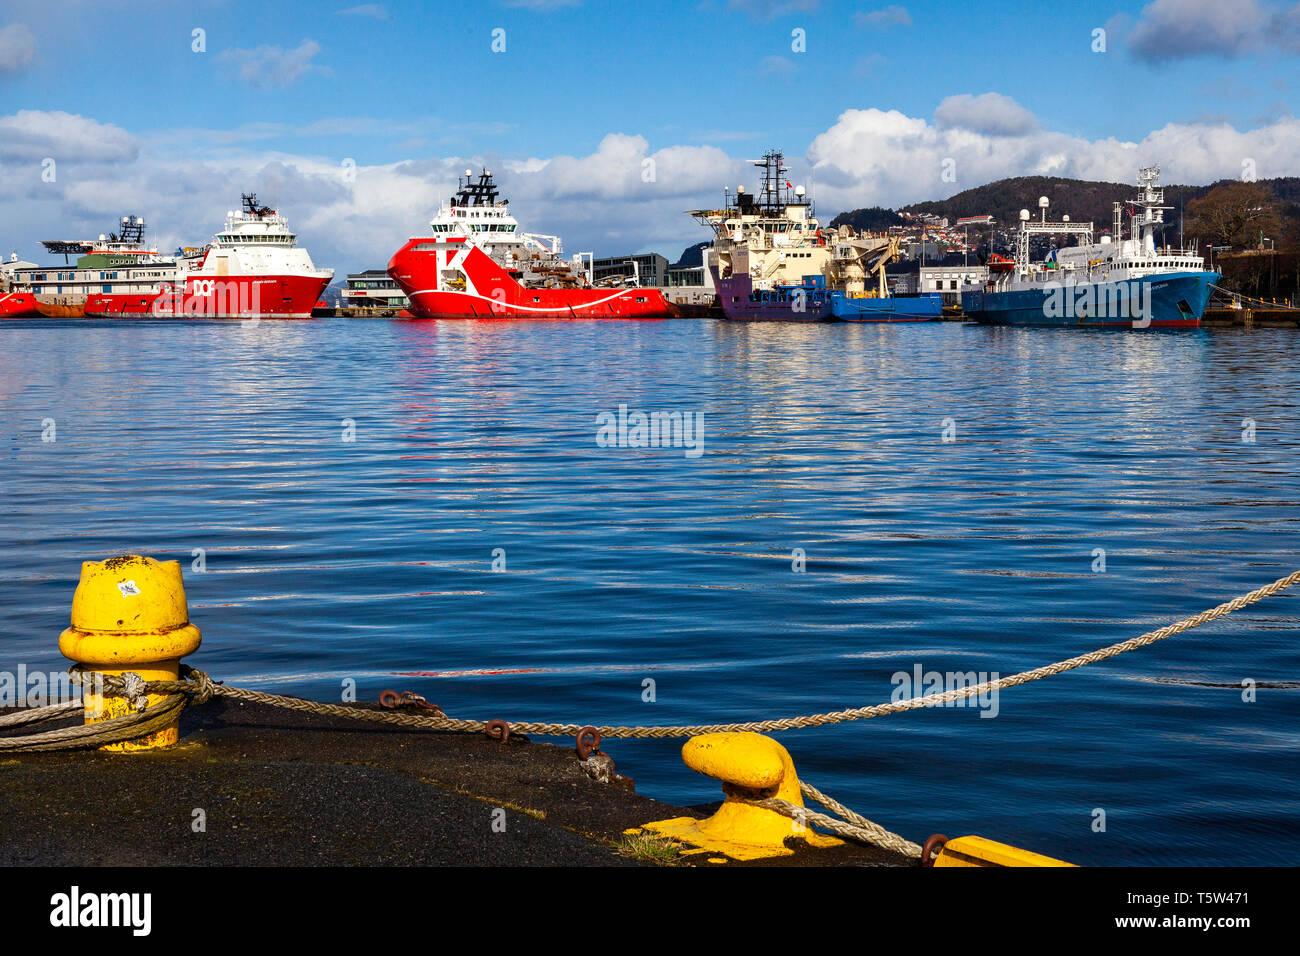 Offshore supply vessels Skandi Bergen, KL Sandefjord and Deep Vision, in port of Bergen, Norway. Skoltegrunnskaien terminal. On right side is resea - Stock Image